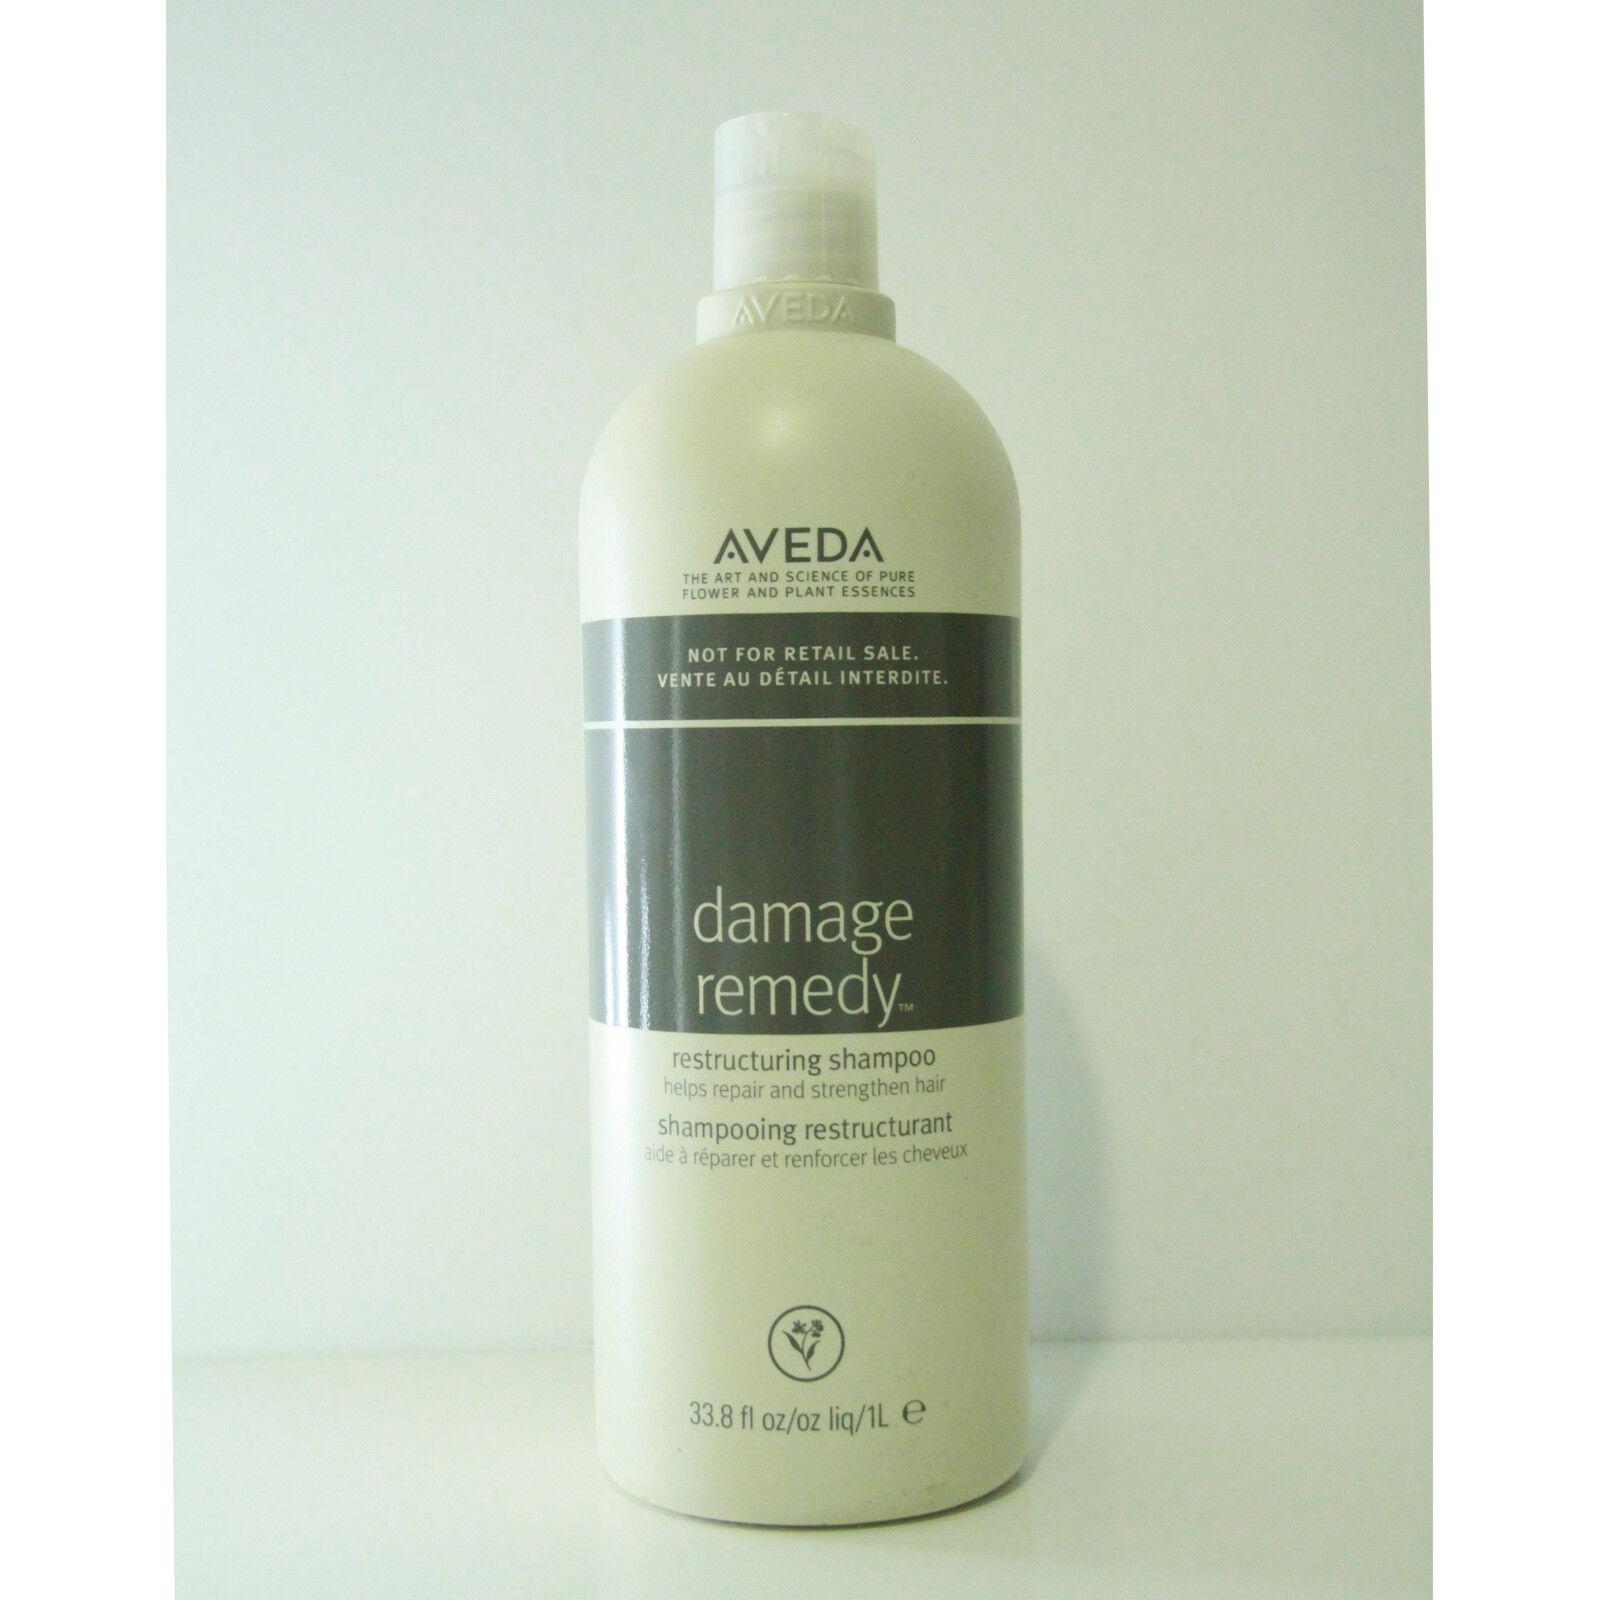 Aveda damage remedy restructuring shampoo 33.8 oz 1 Liter